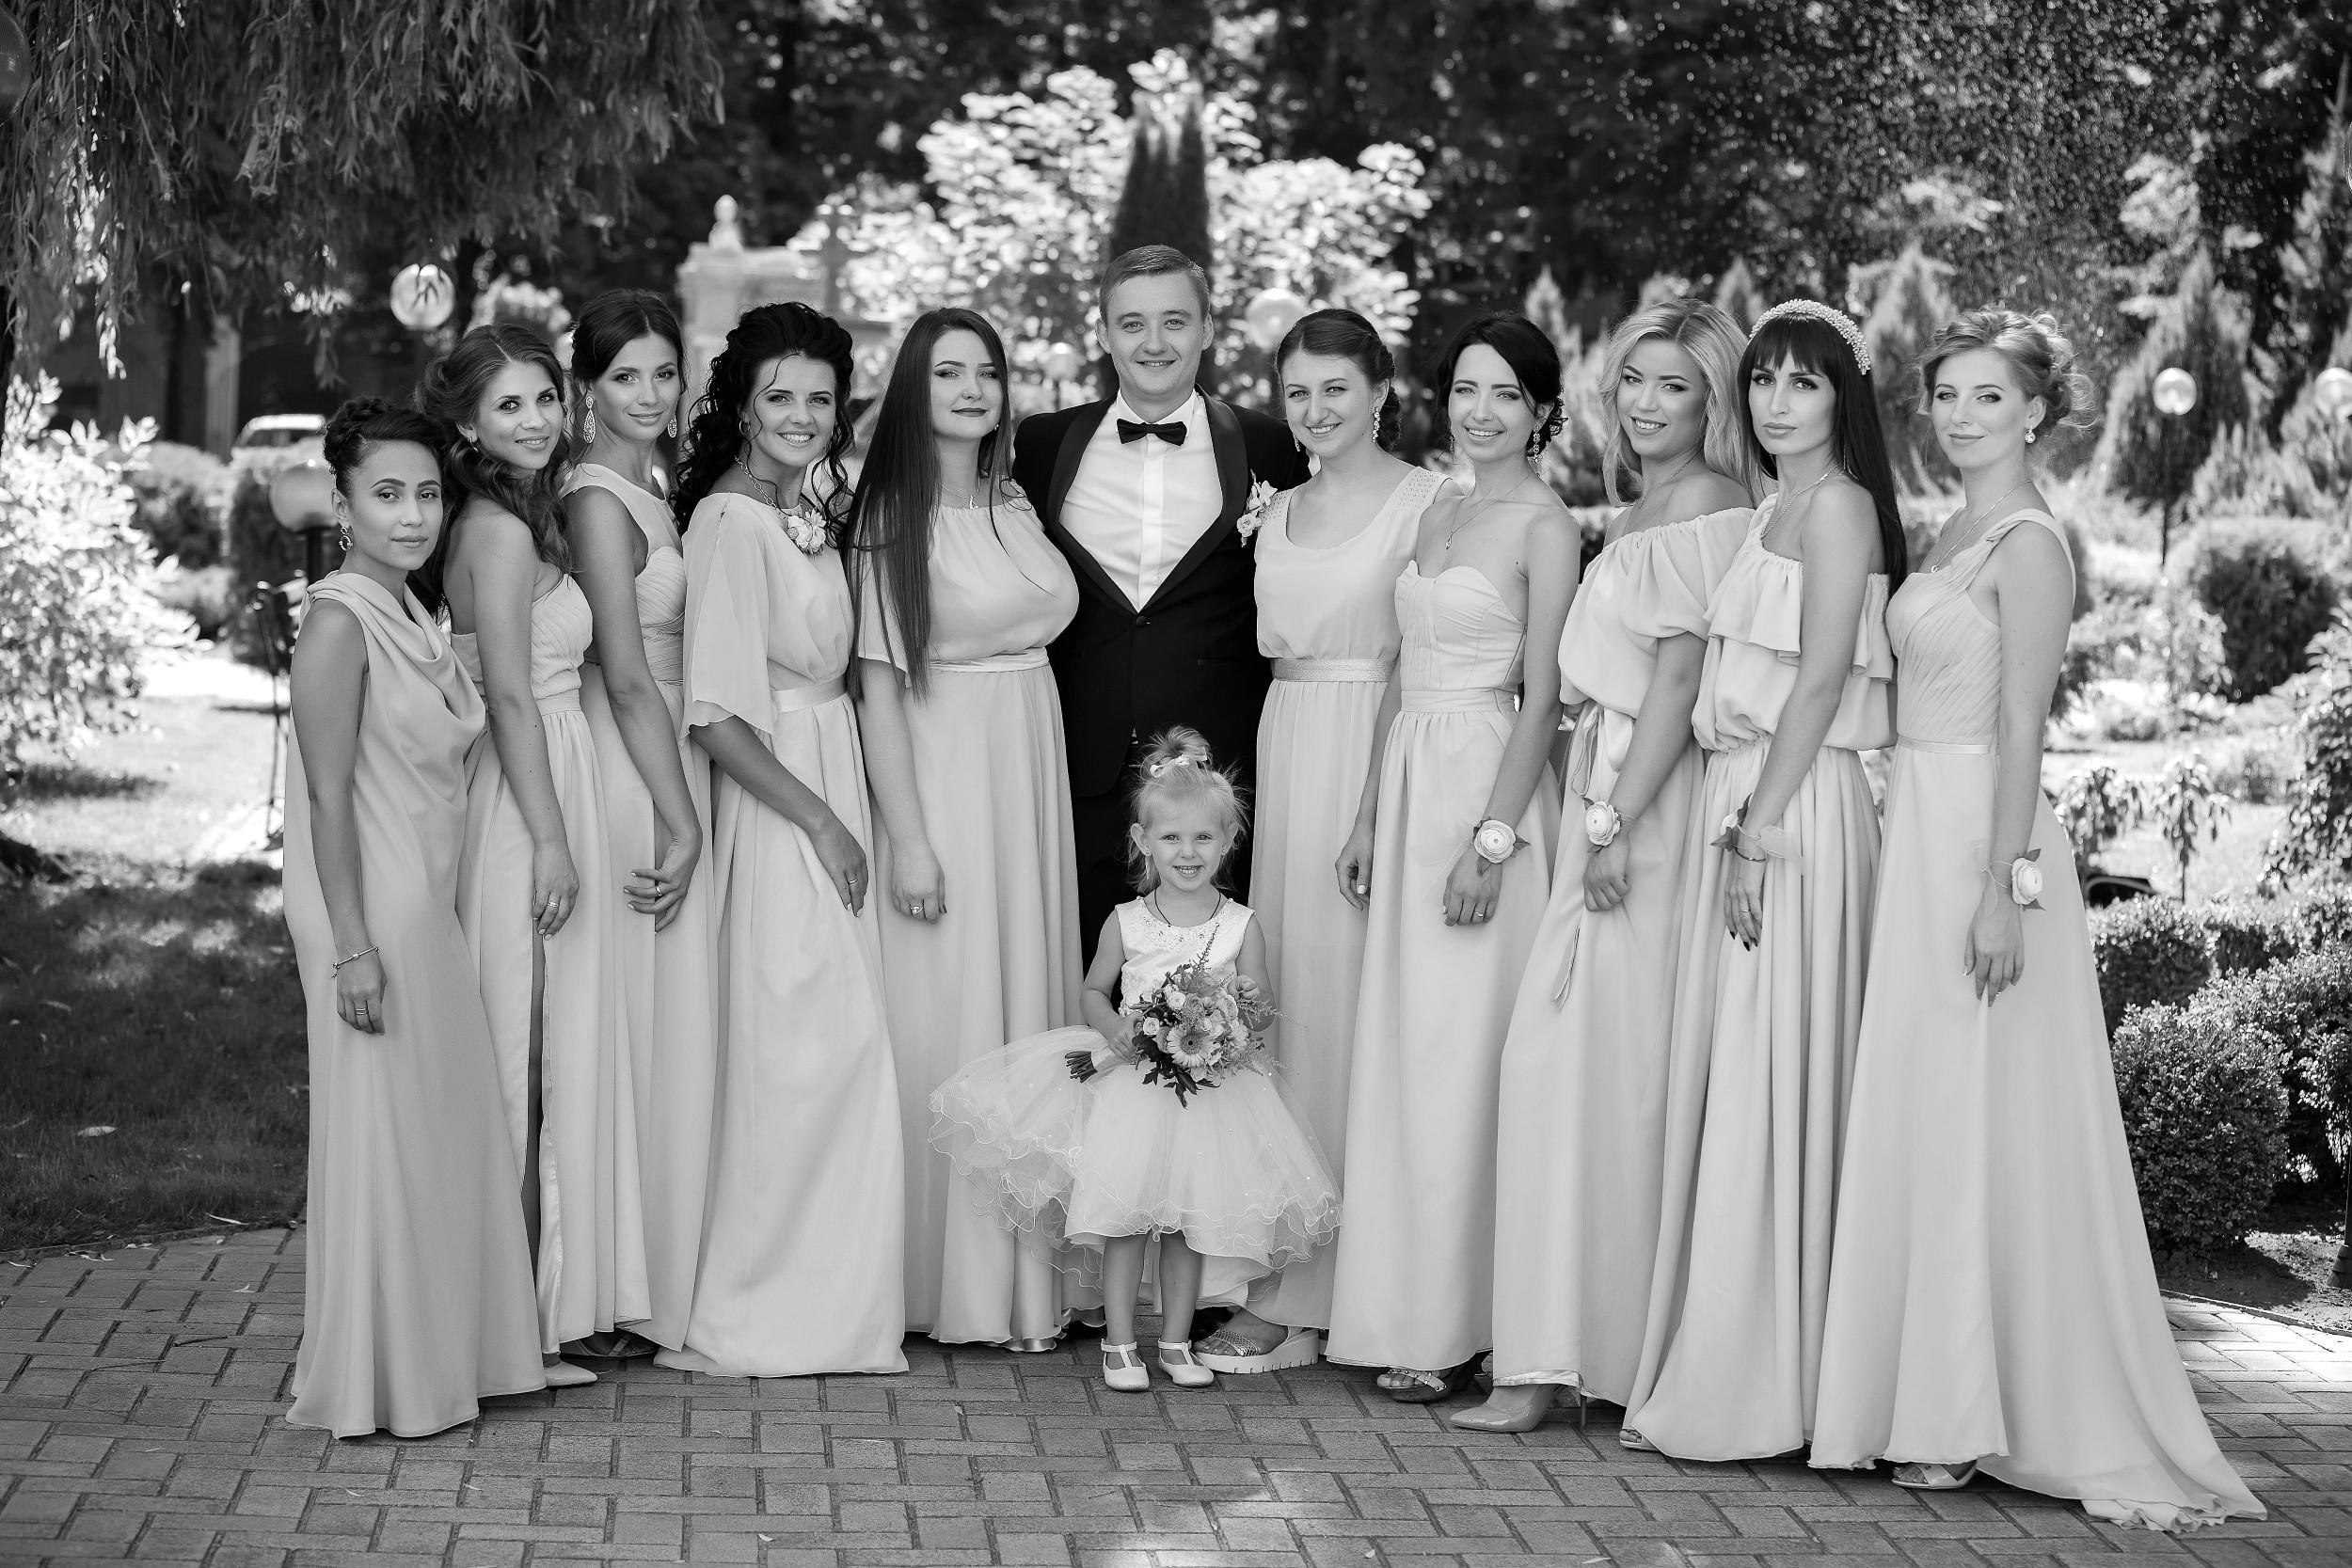 CANON WEDDING BRIDESMAIDS WITH BRIDE PHOTO AWARDS 003445 (Custom)